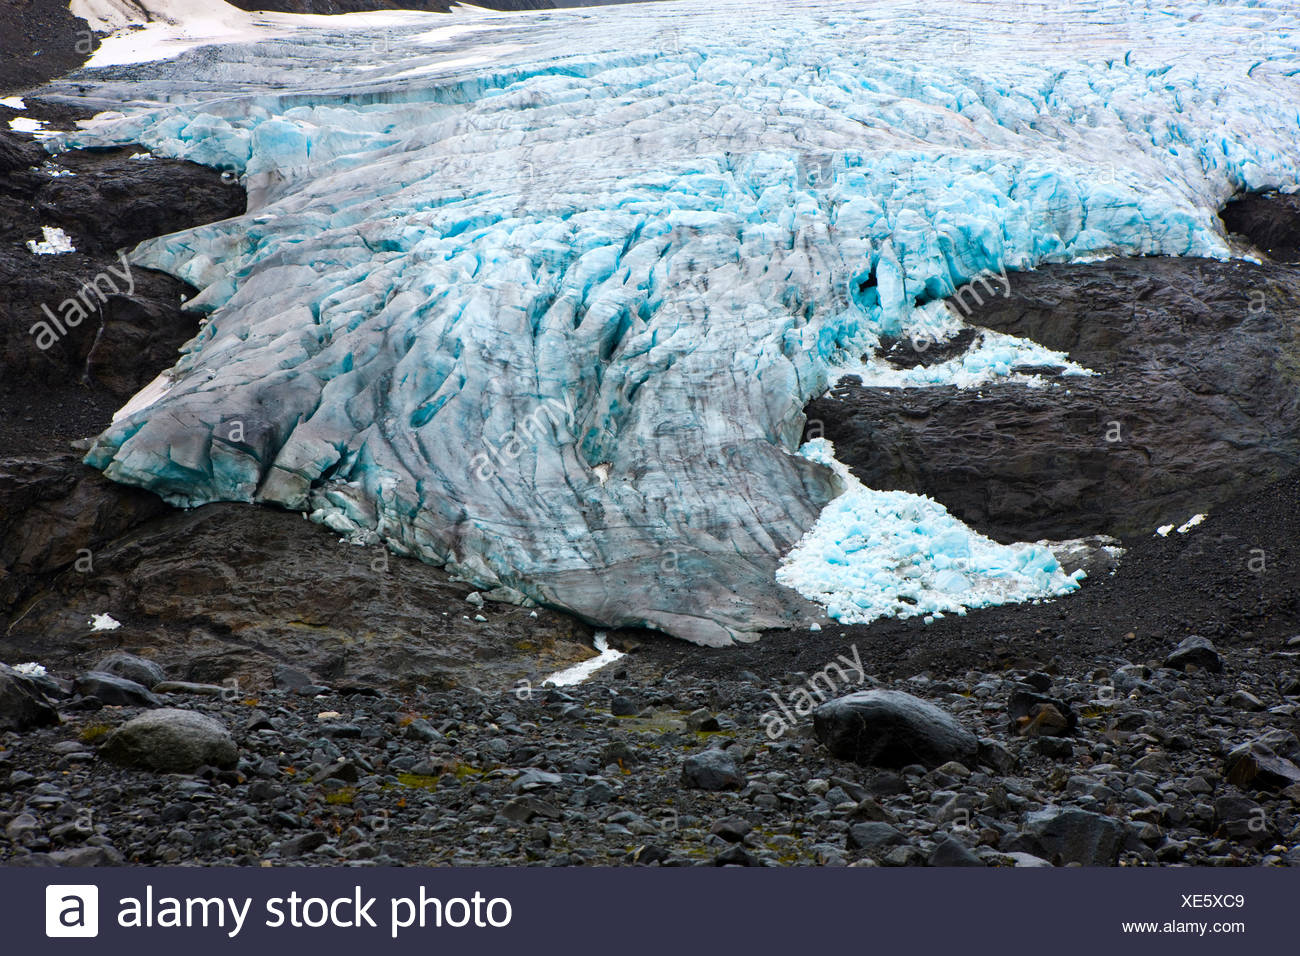 Glacier tounge, Norway, Scandinavia, Europe Stock Photo